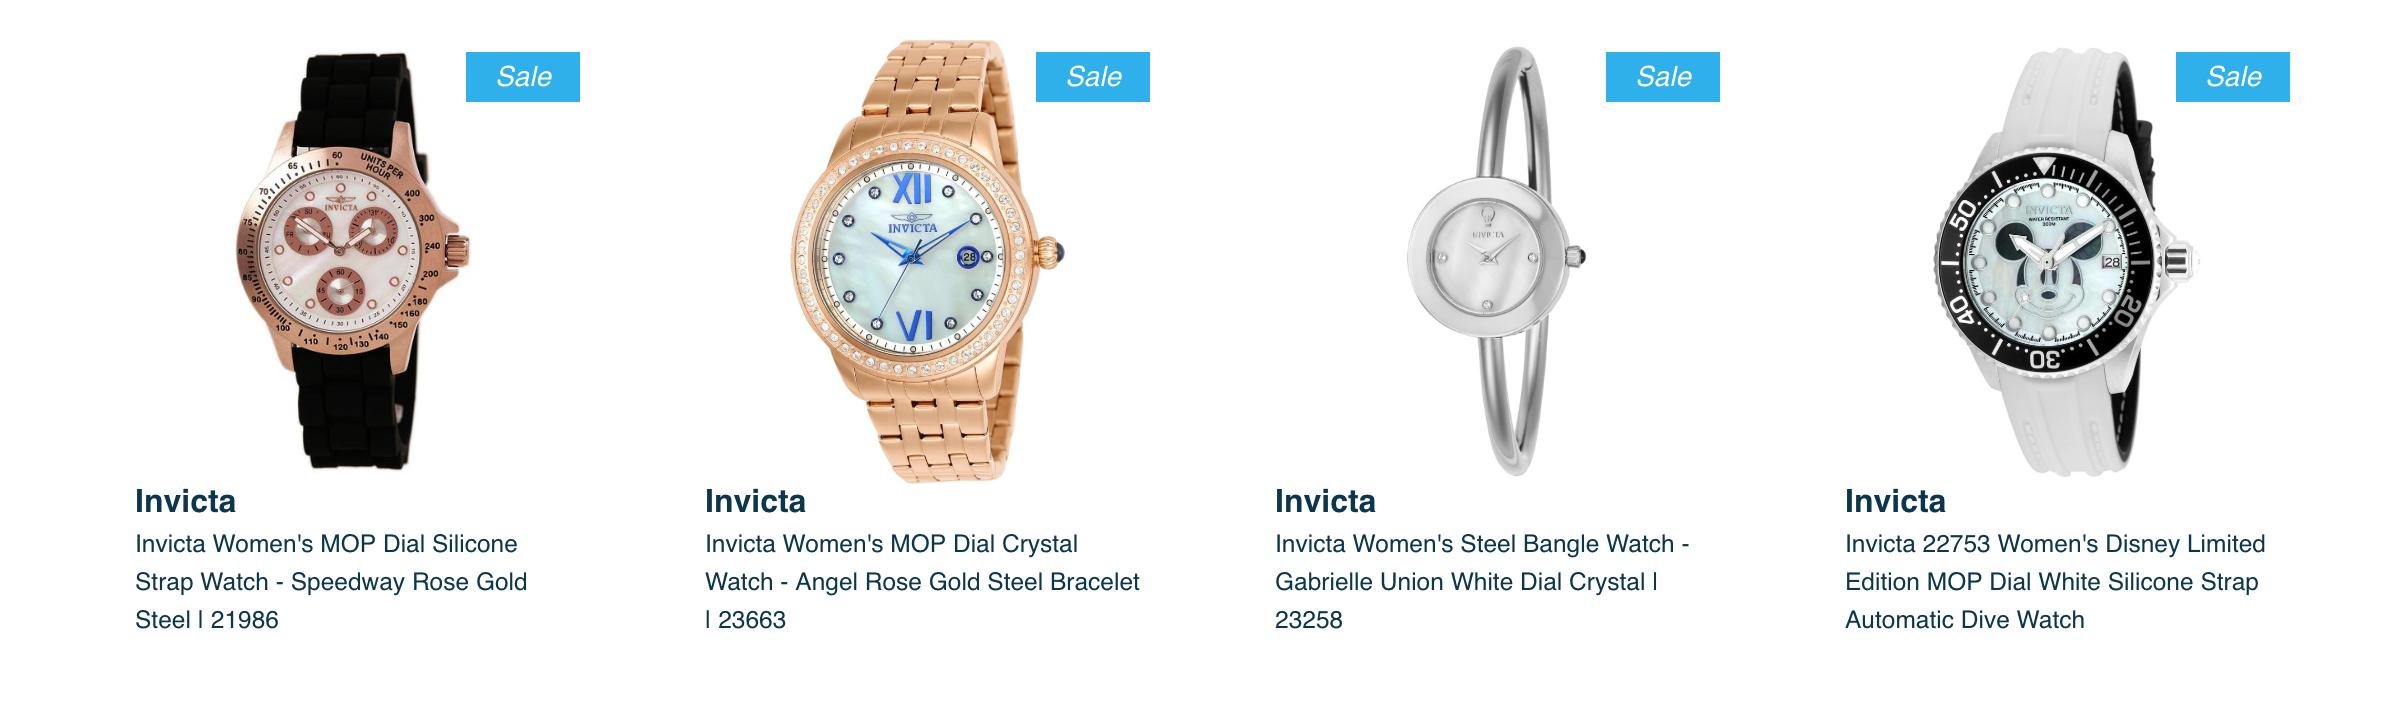 Watch Lover Gift Ideas